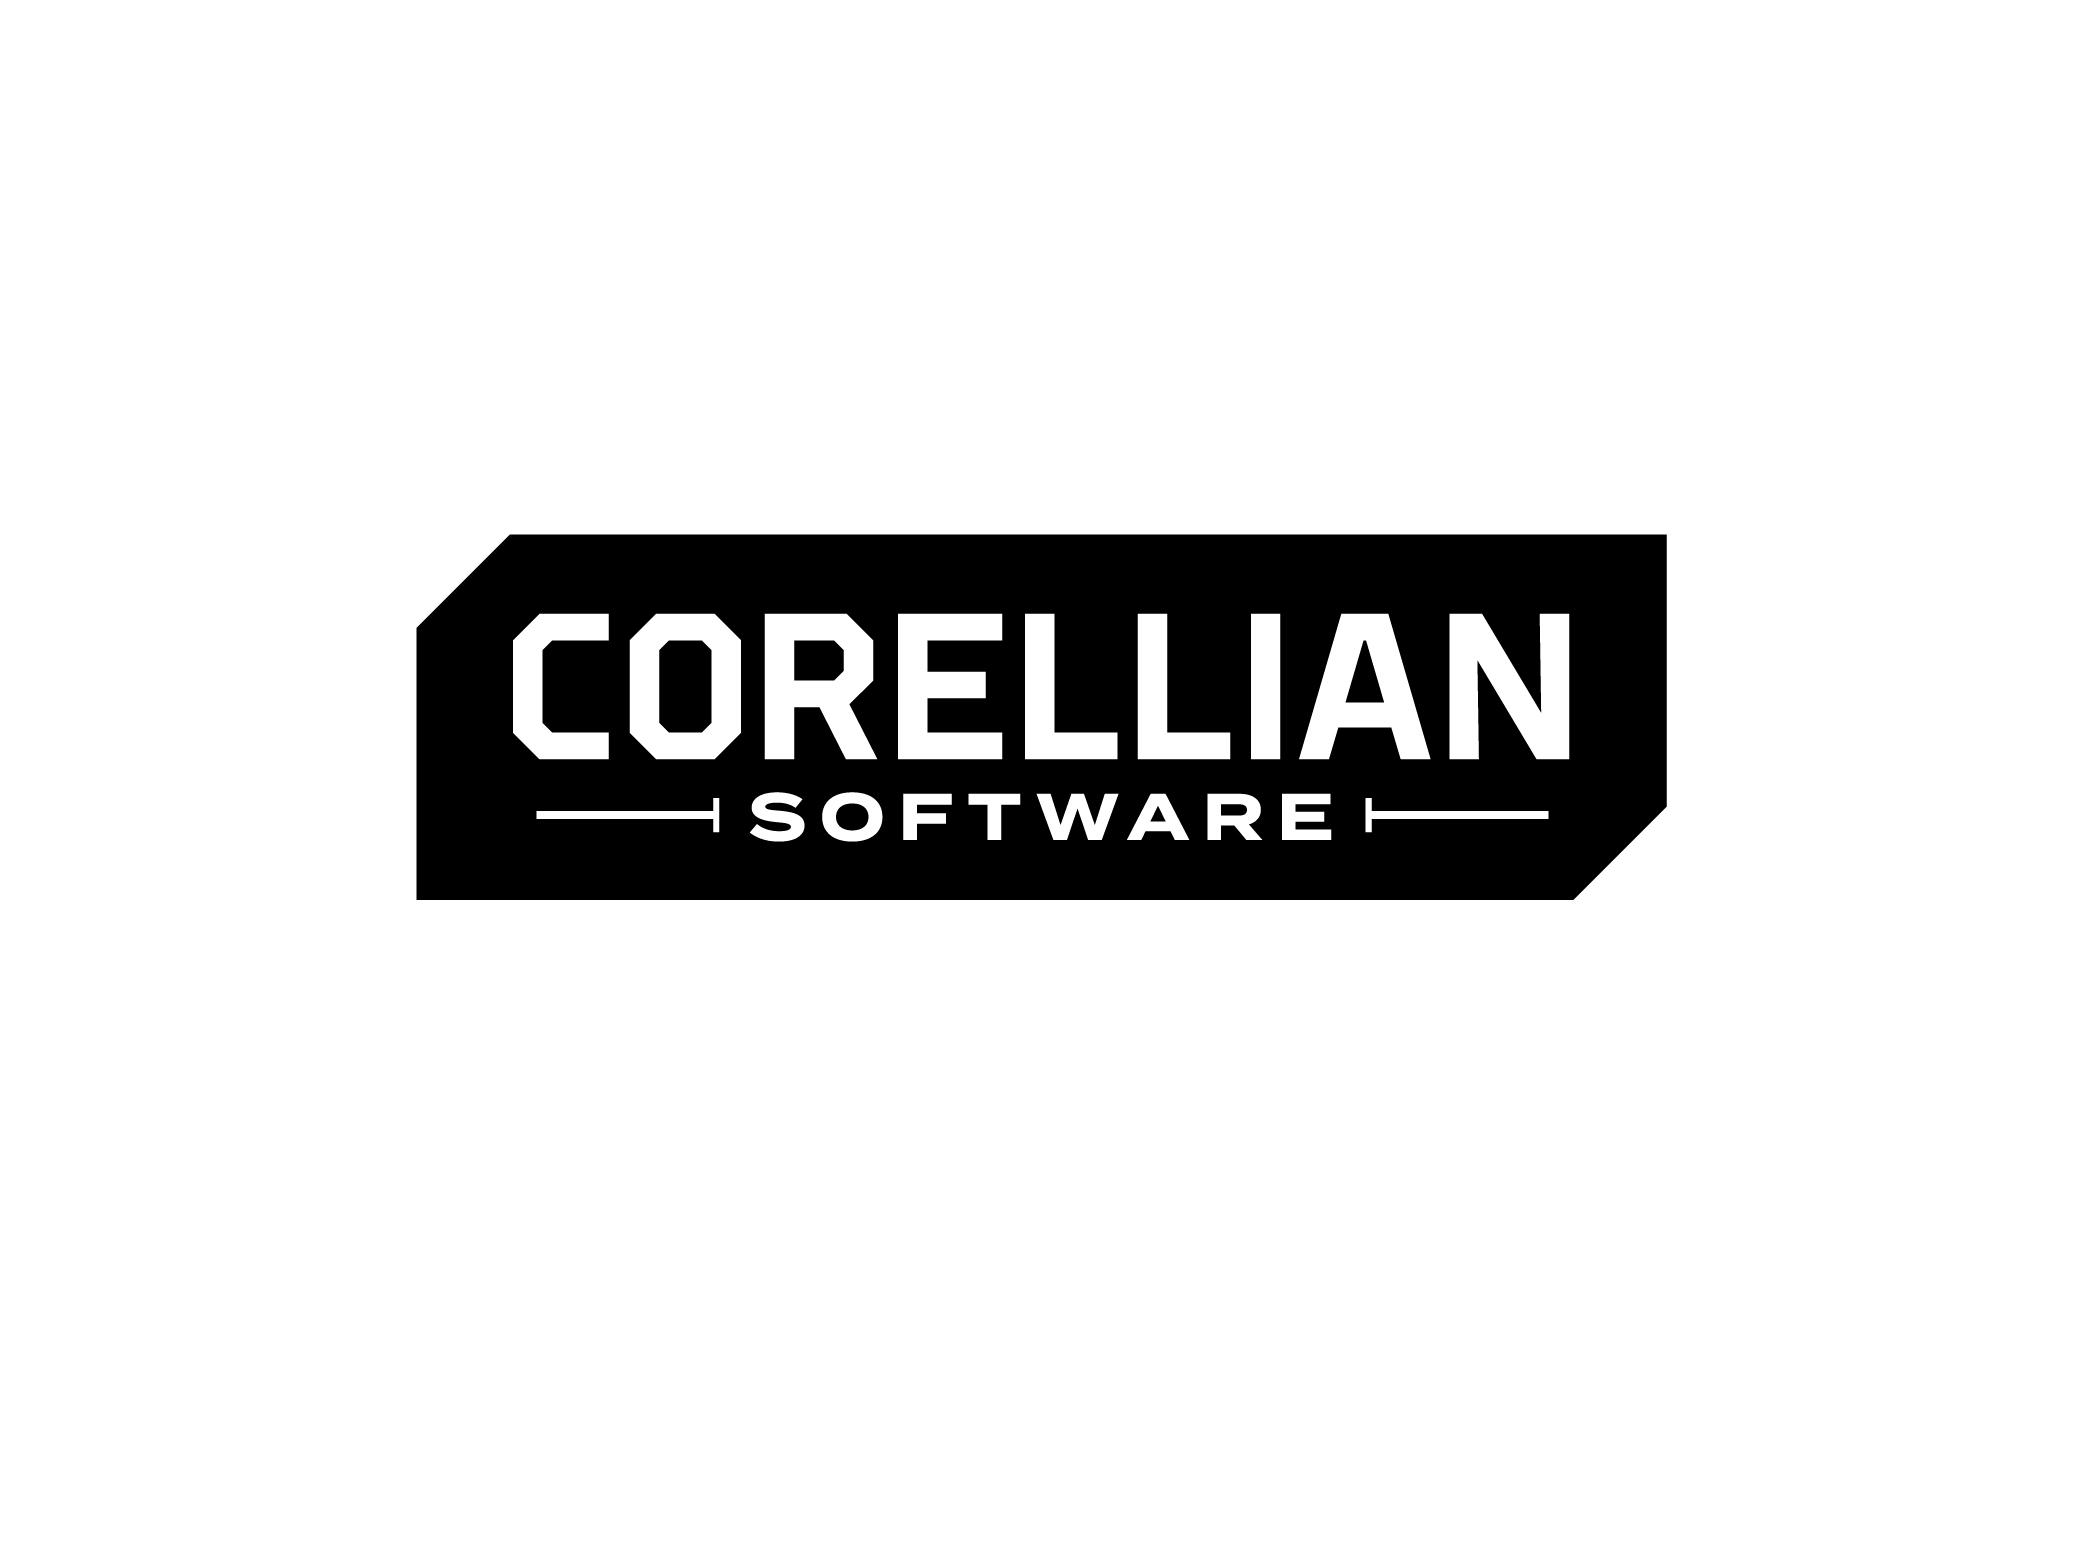 pbd_site2018_work_corellian logo.jpg